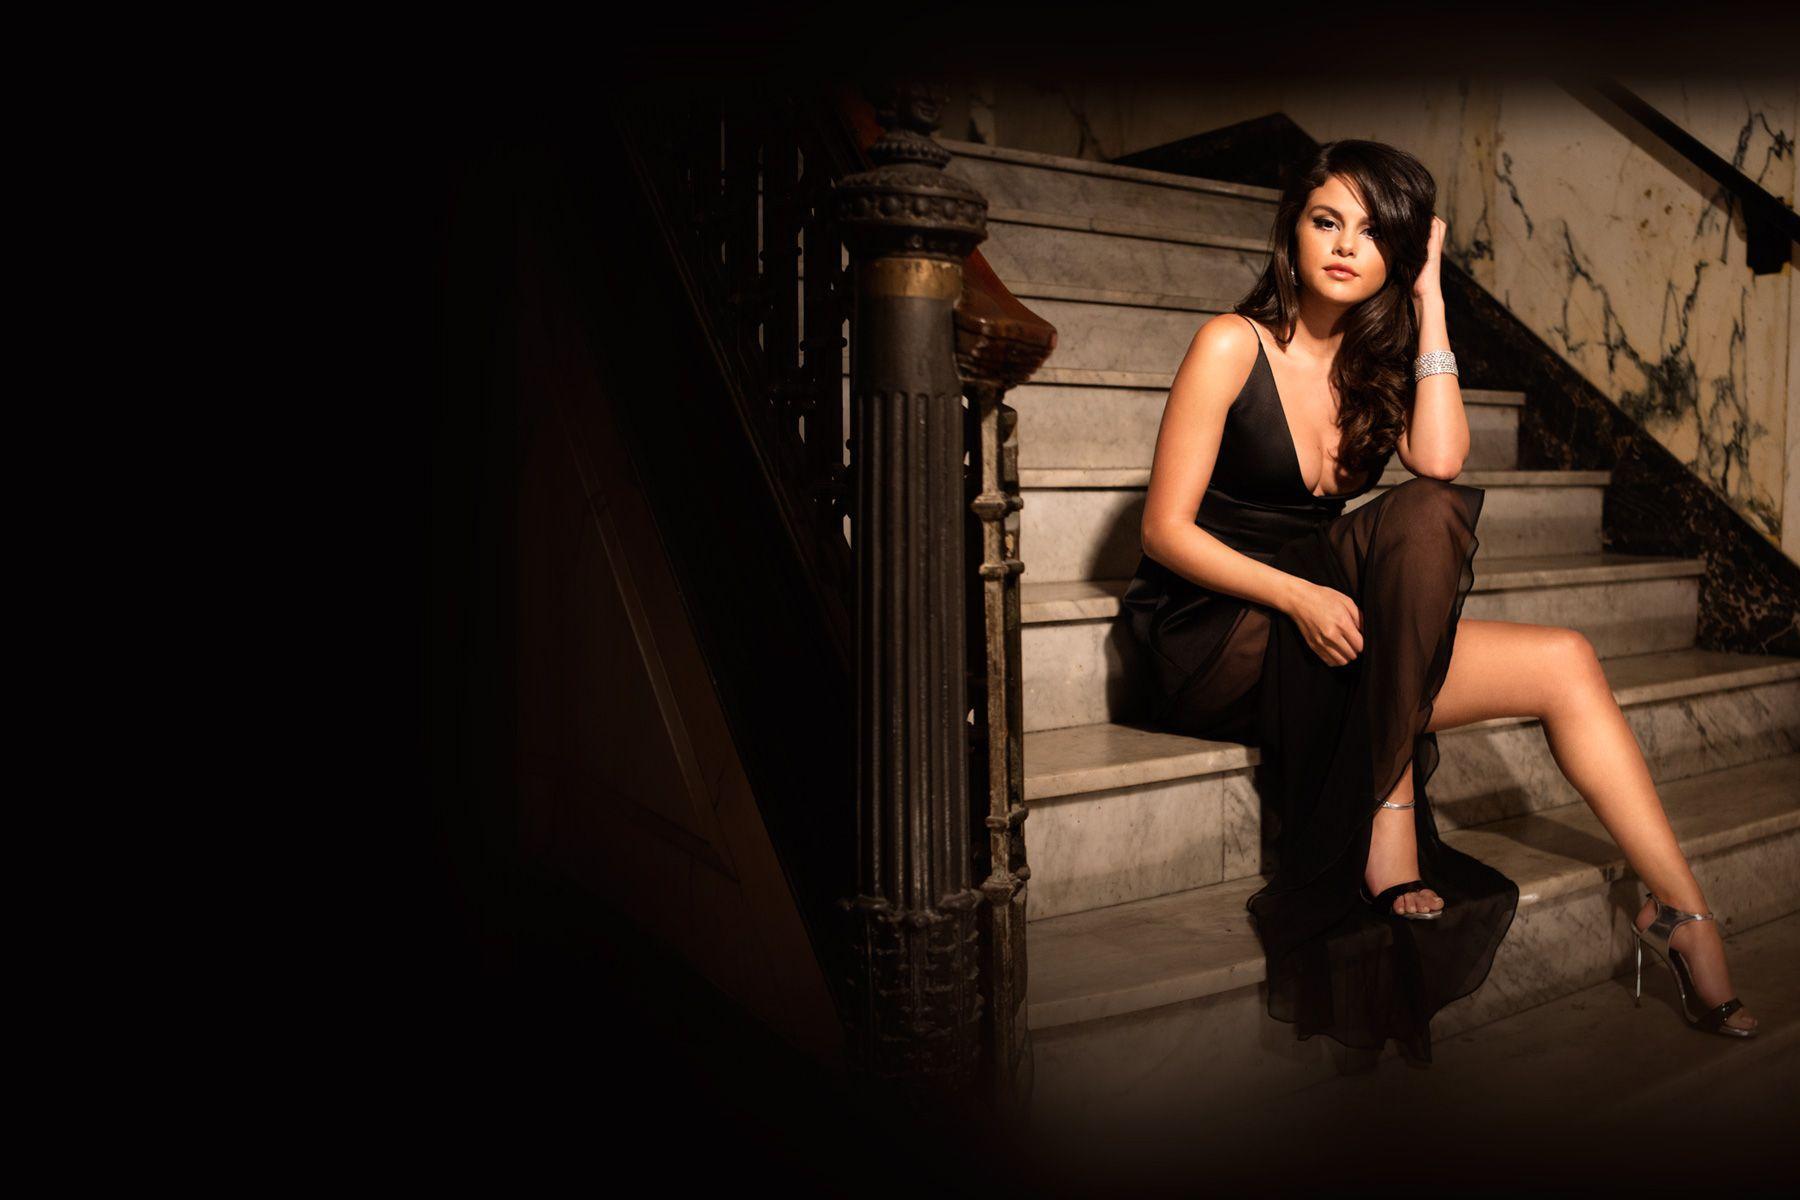 Selena Gomez Wallpaper HD